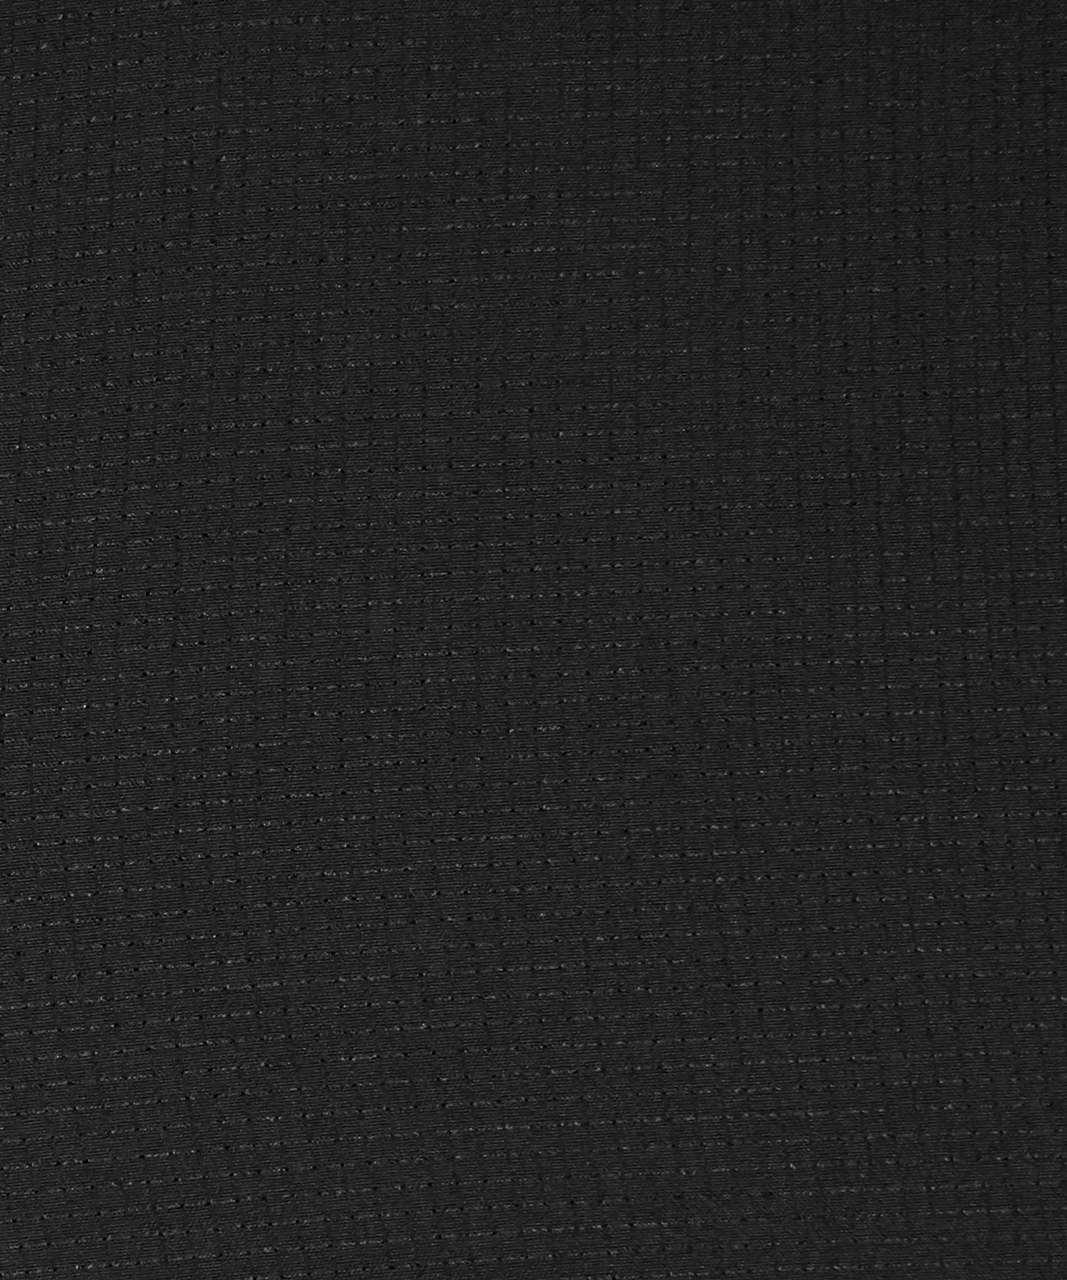 Lululemon ABC Jogger *Light - Black